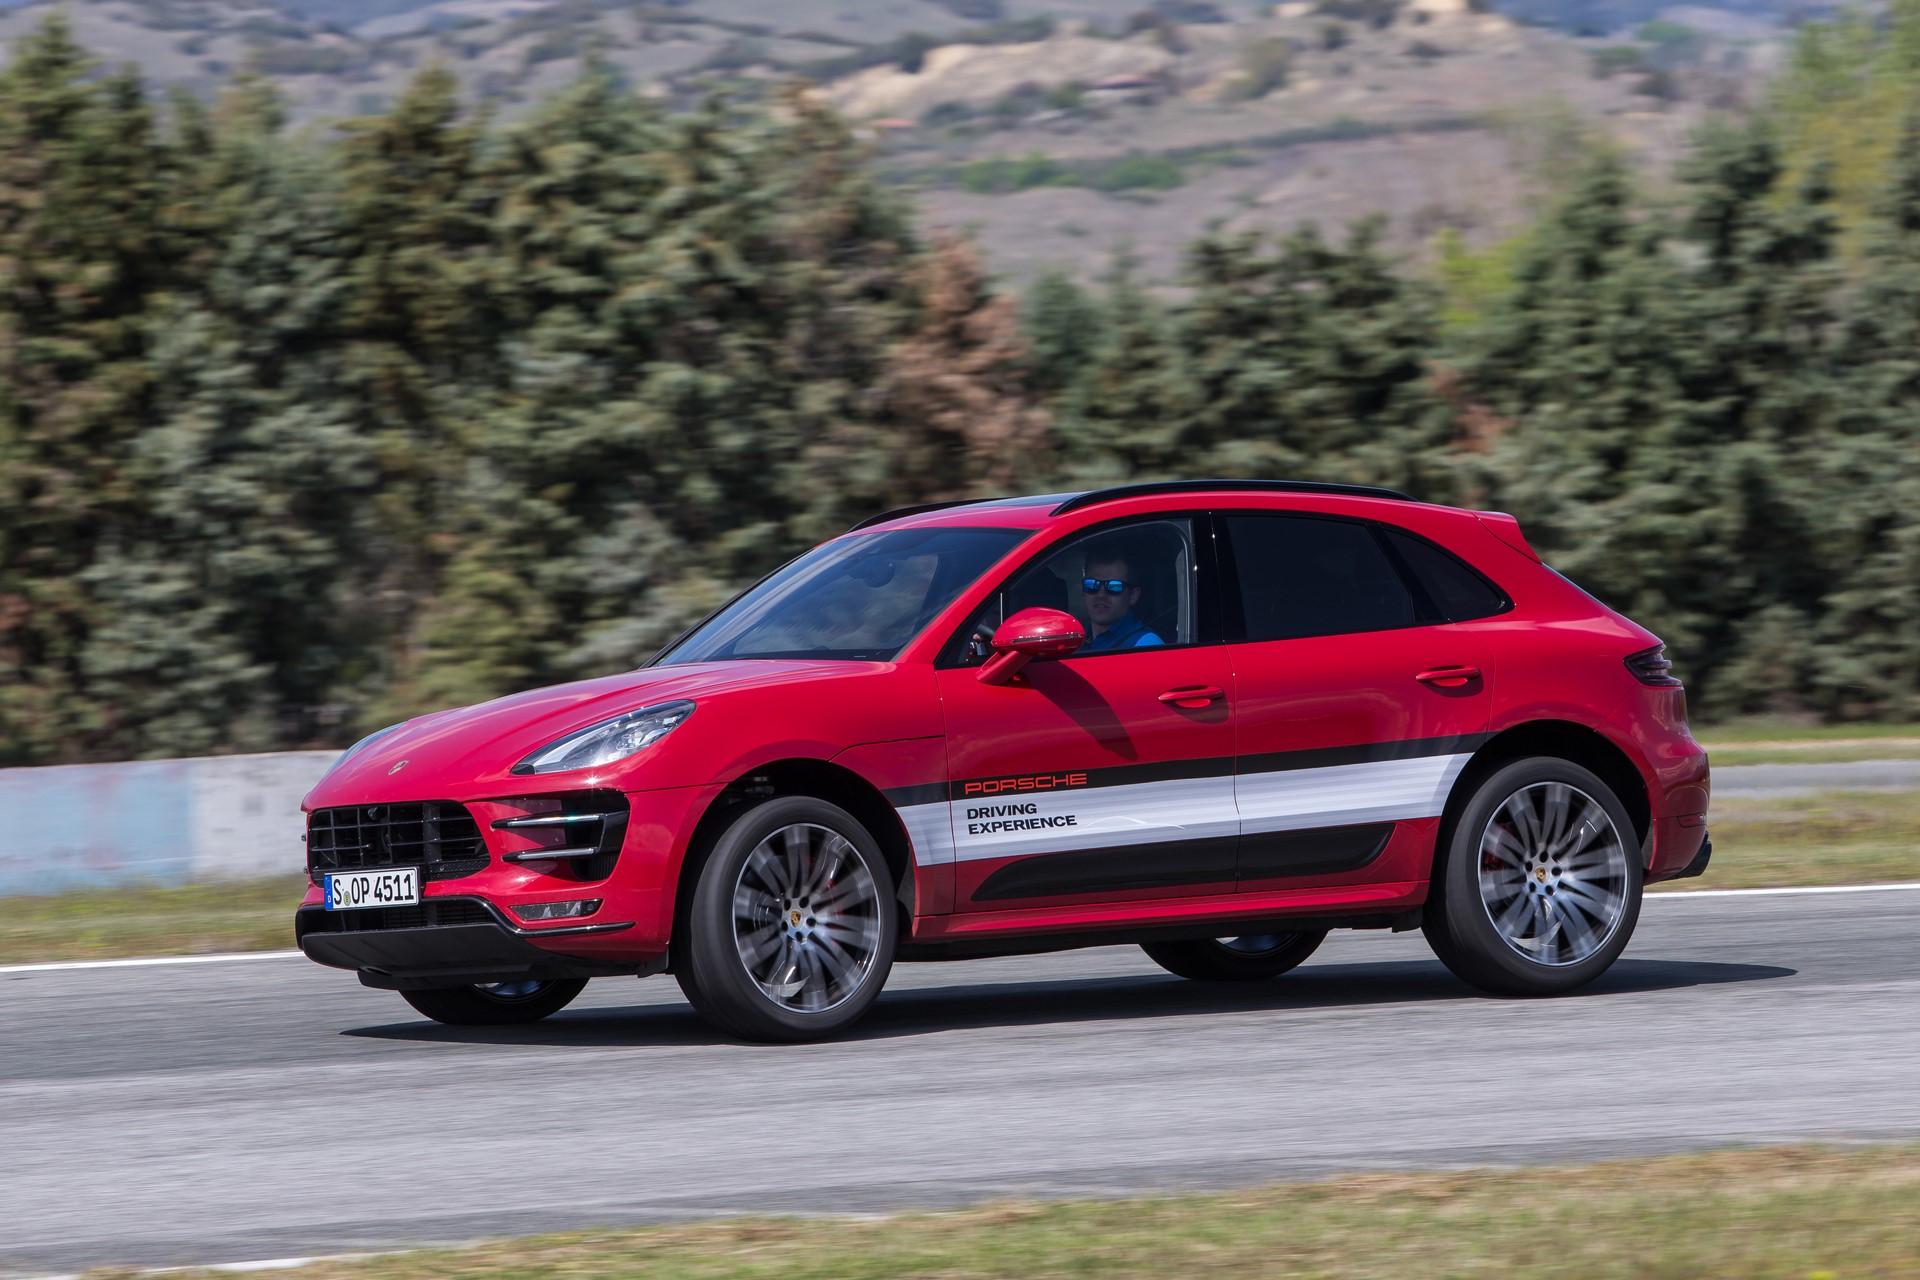 Porsche Driving Experience 2017 Serres (99)